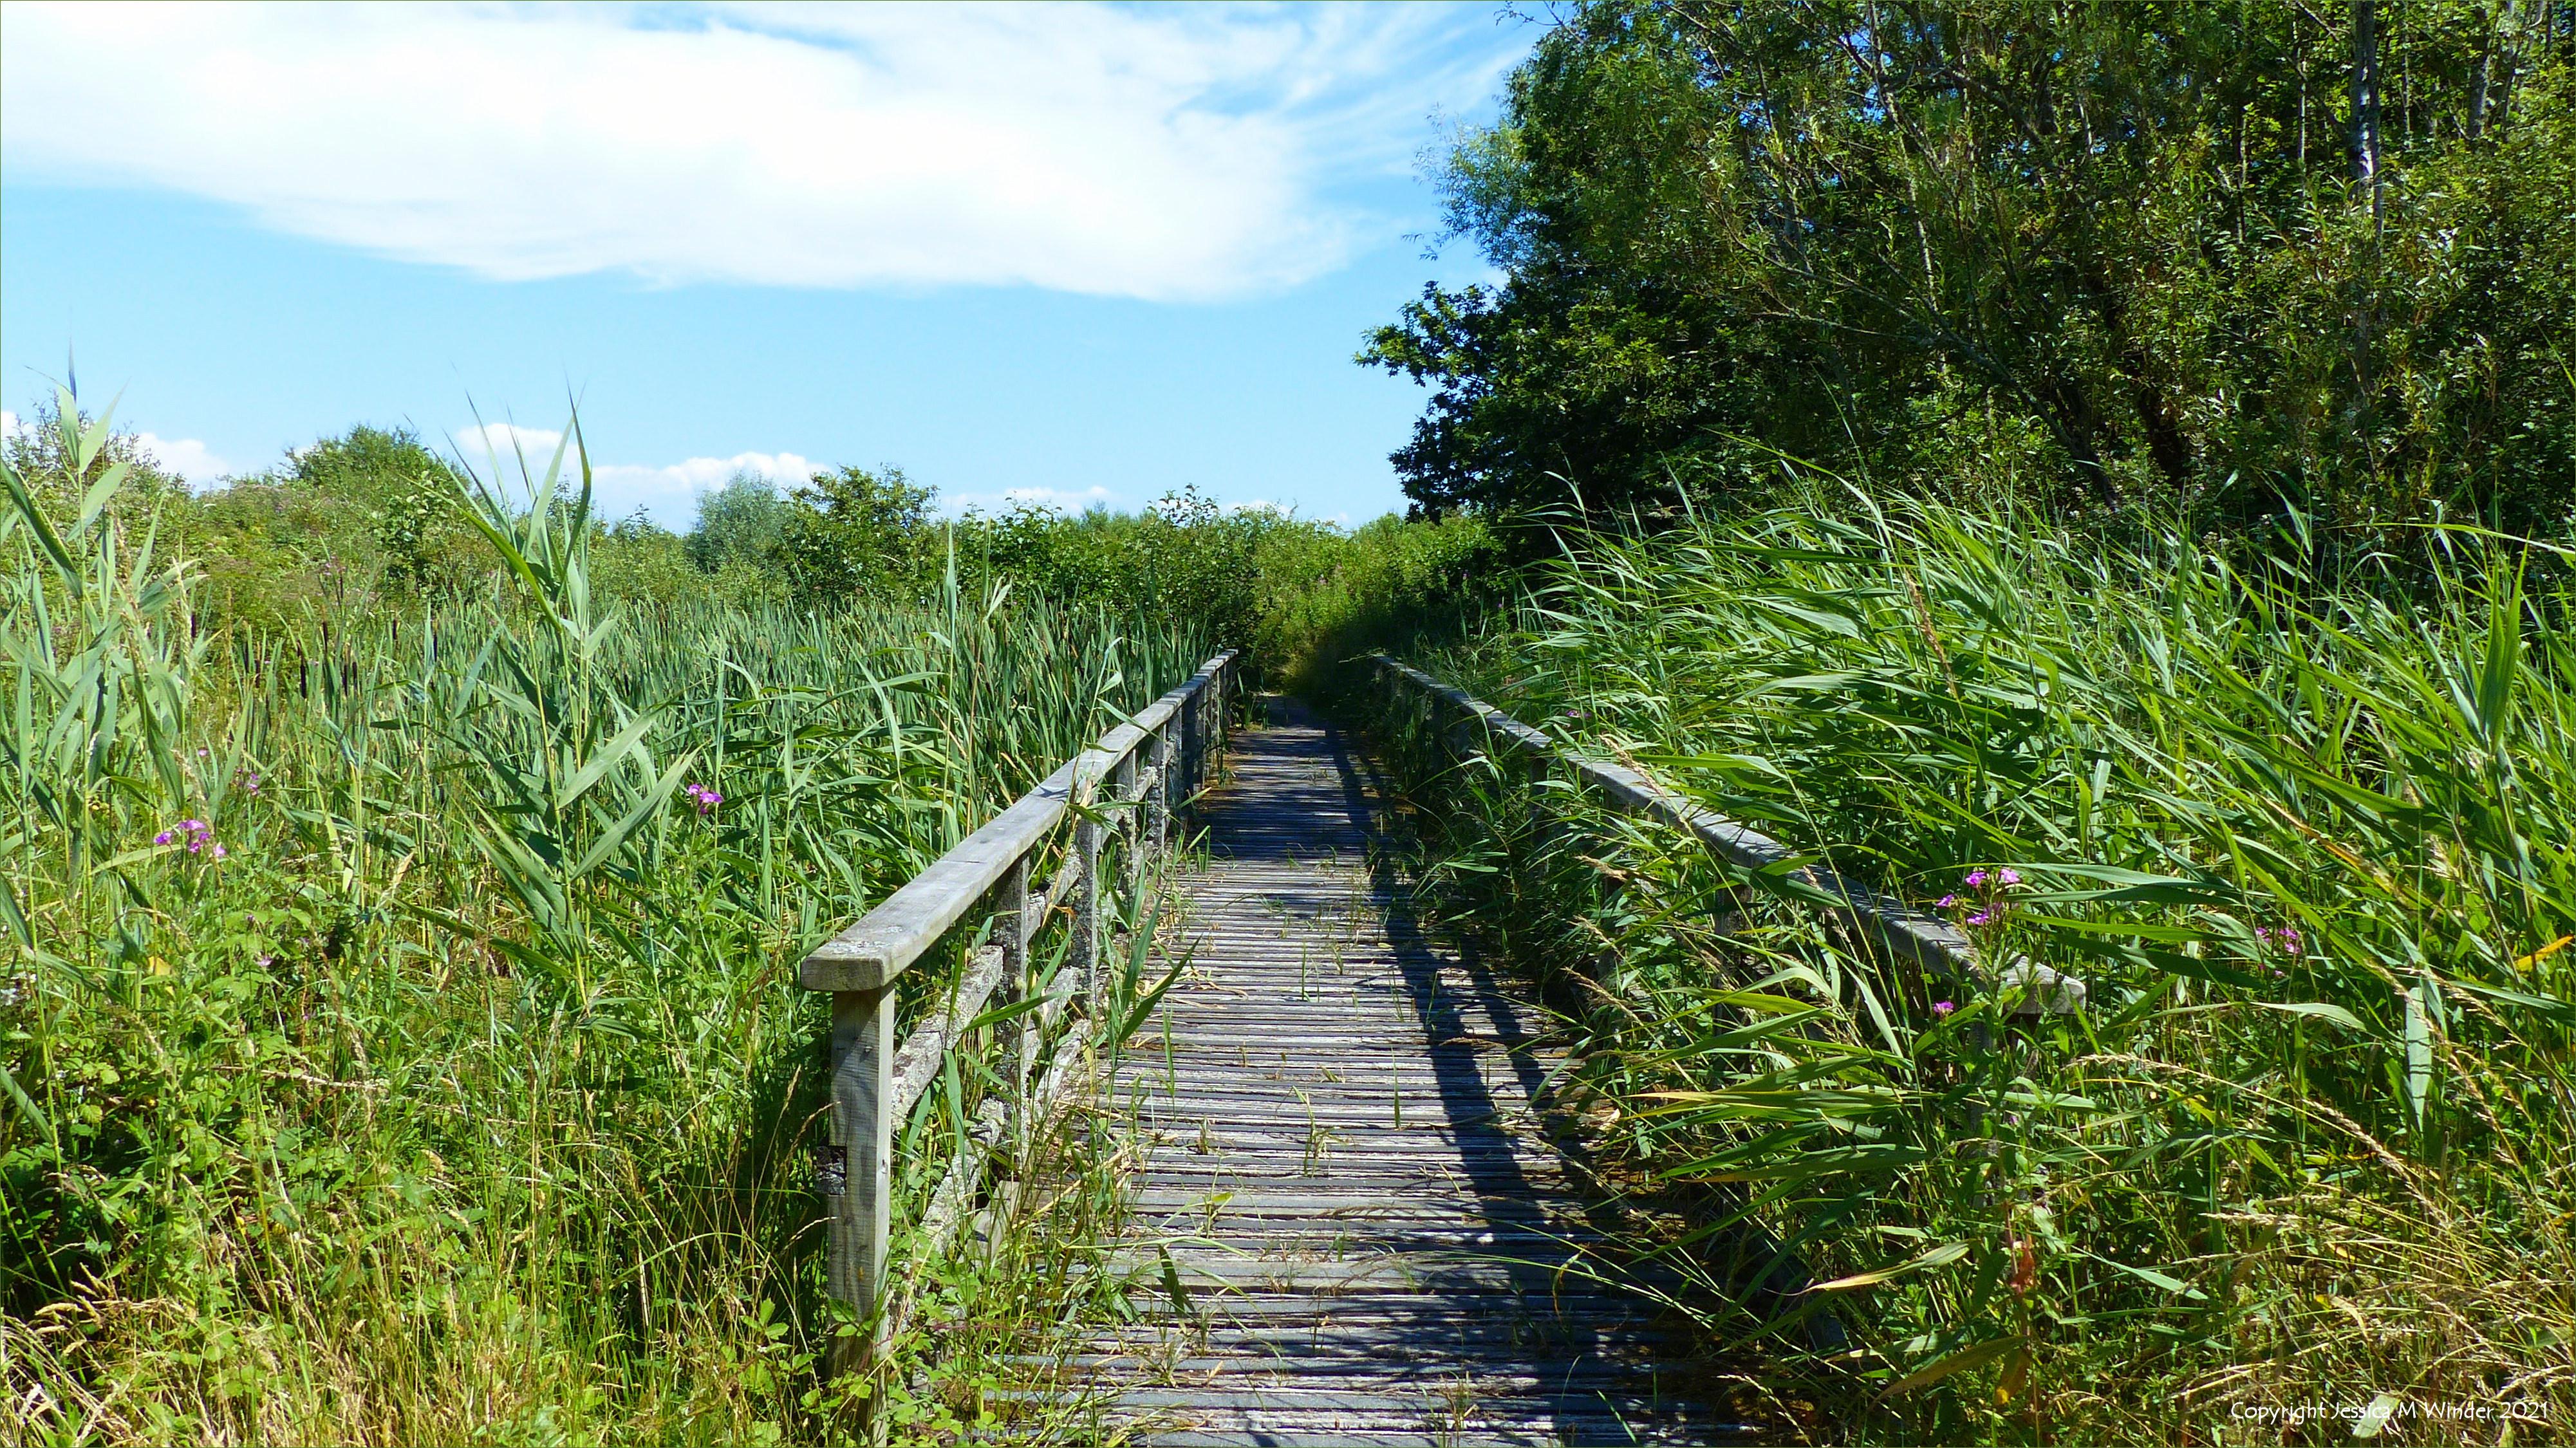 Tall waterside reeds and a wooden footbridge in wetlands